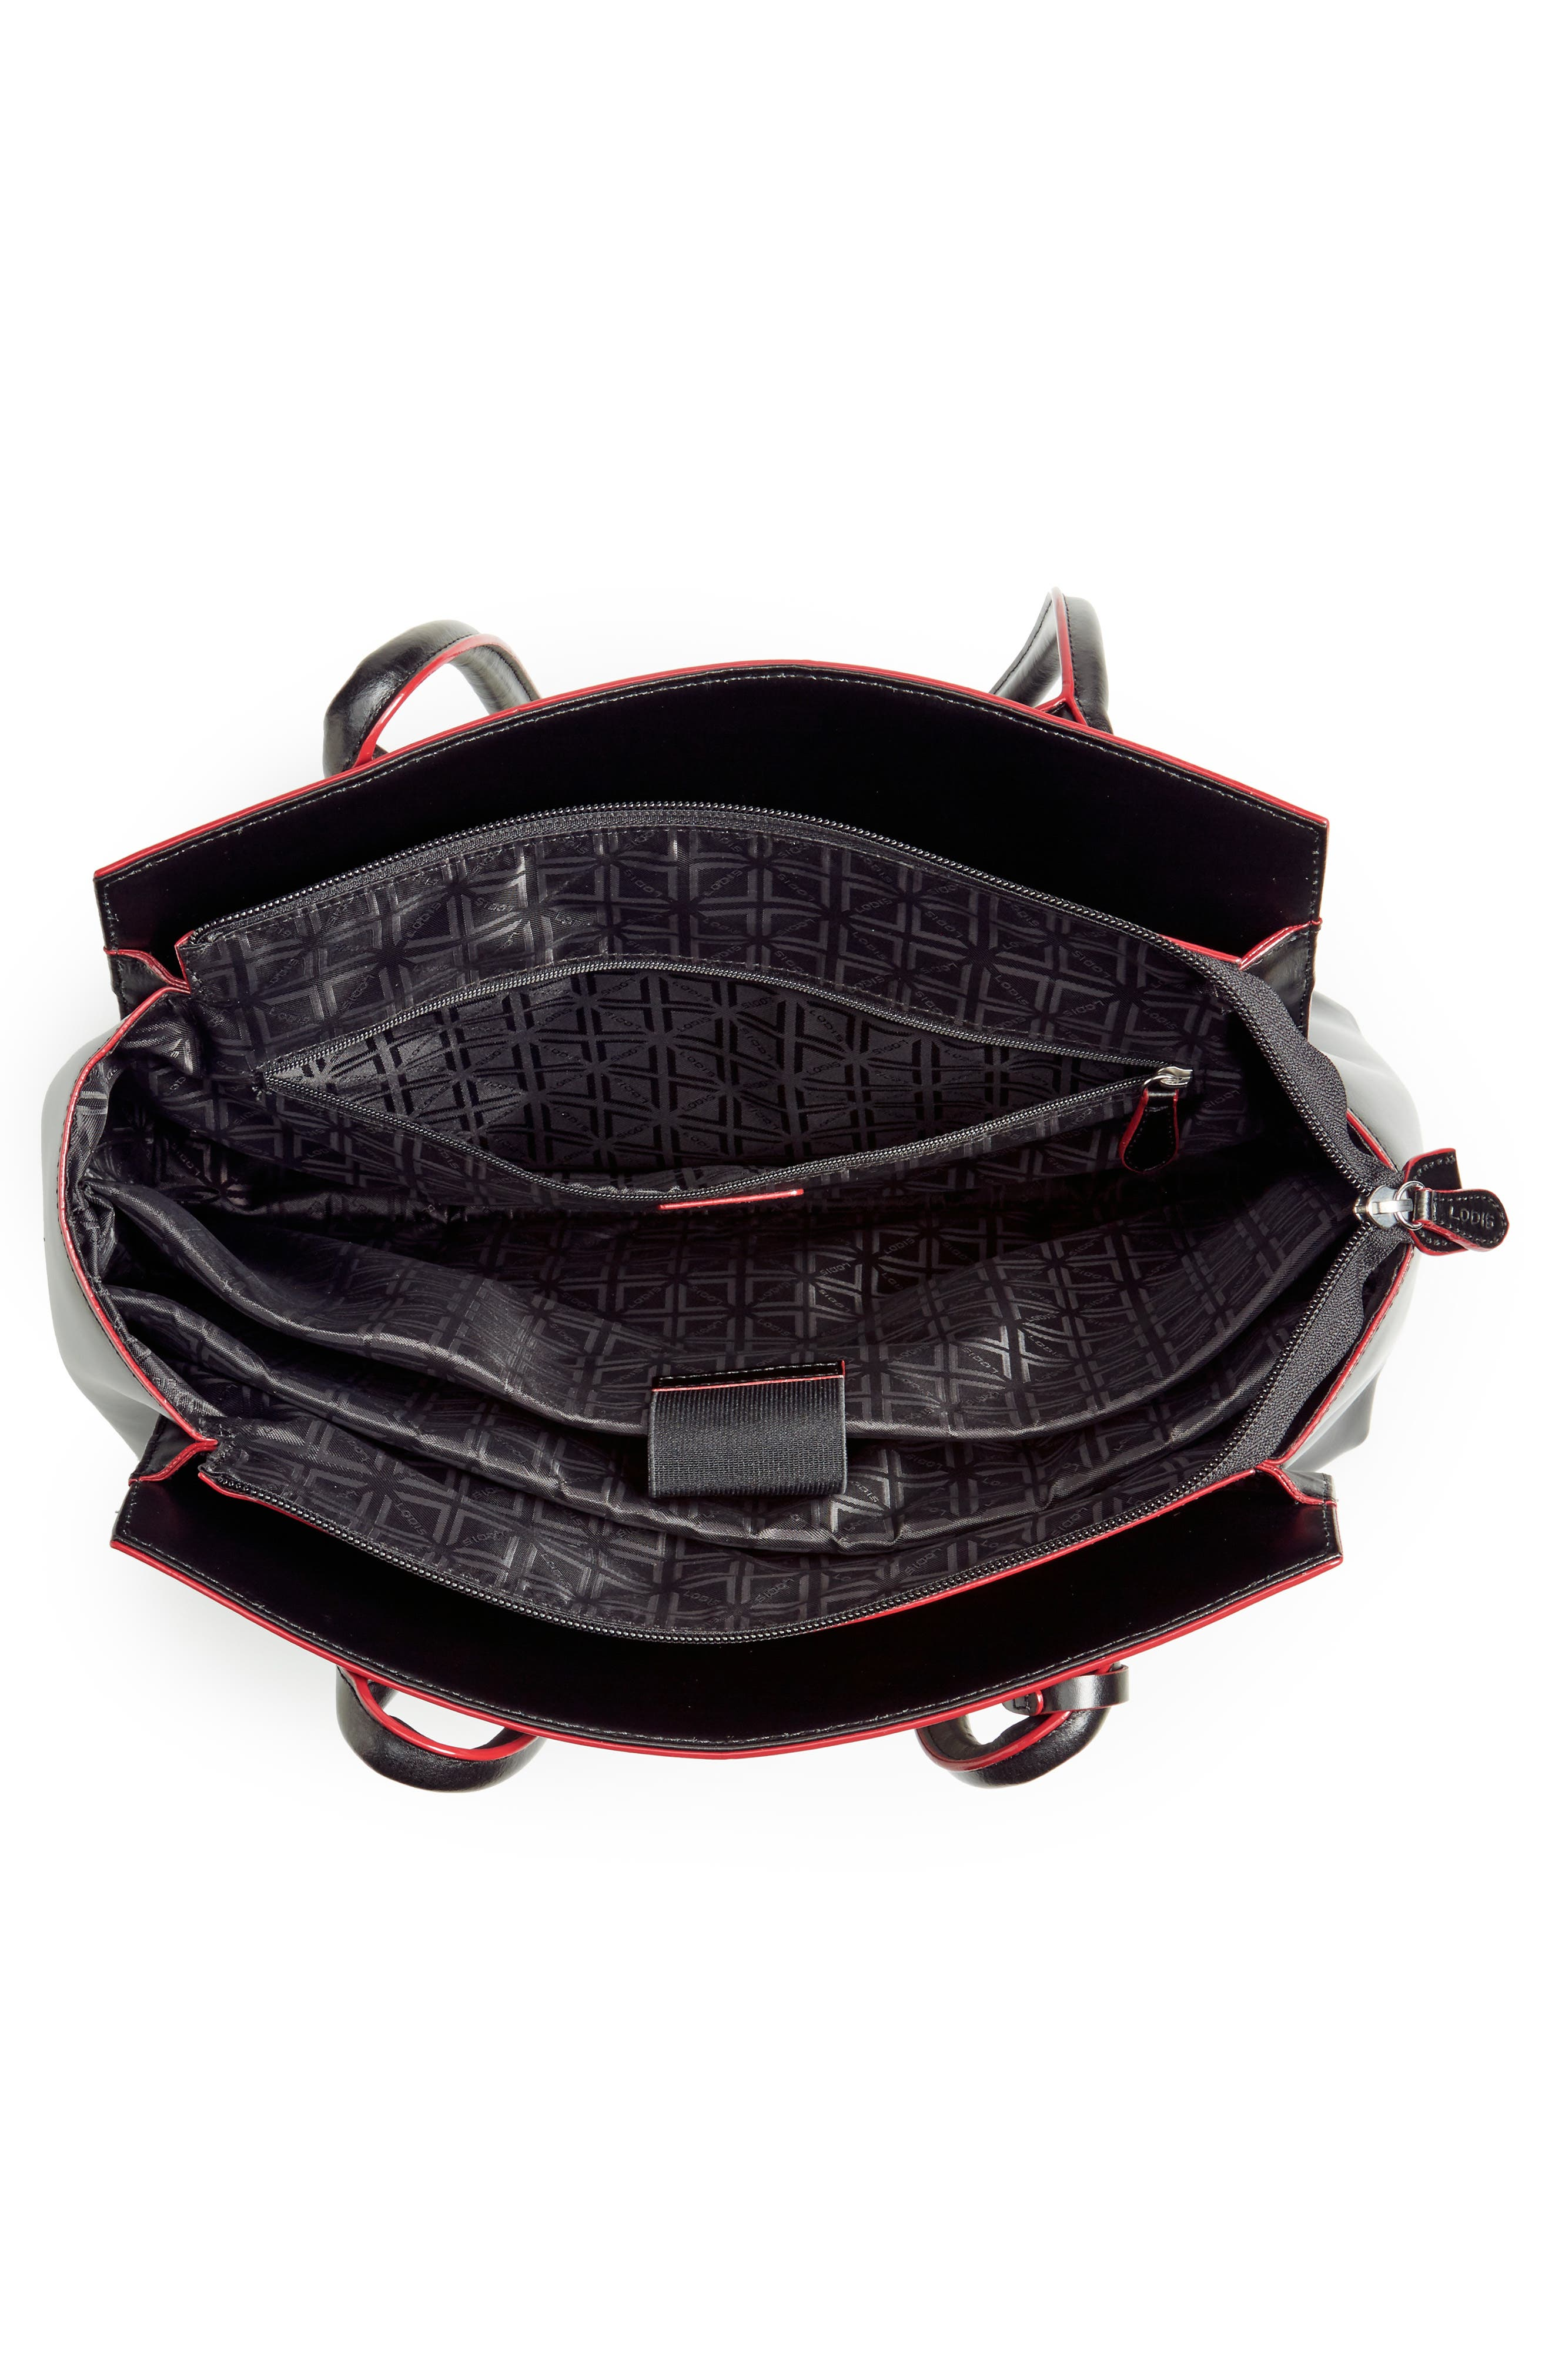 Audrey Under Lock & Key - Zola RFID Leather Tote,                             Alternate thumbnail 4, color,                             BLACK